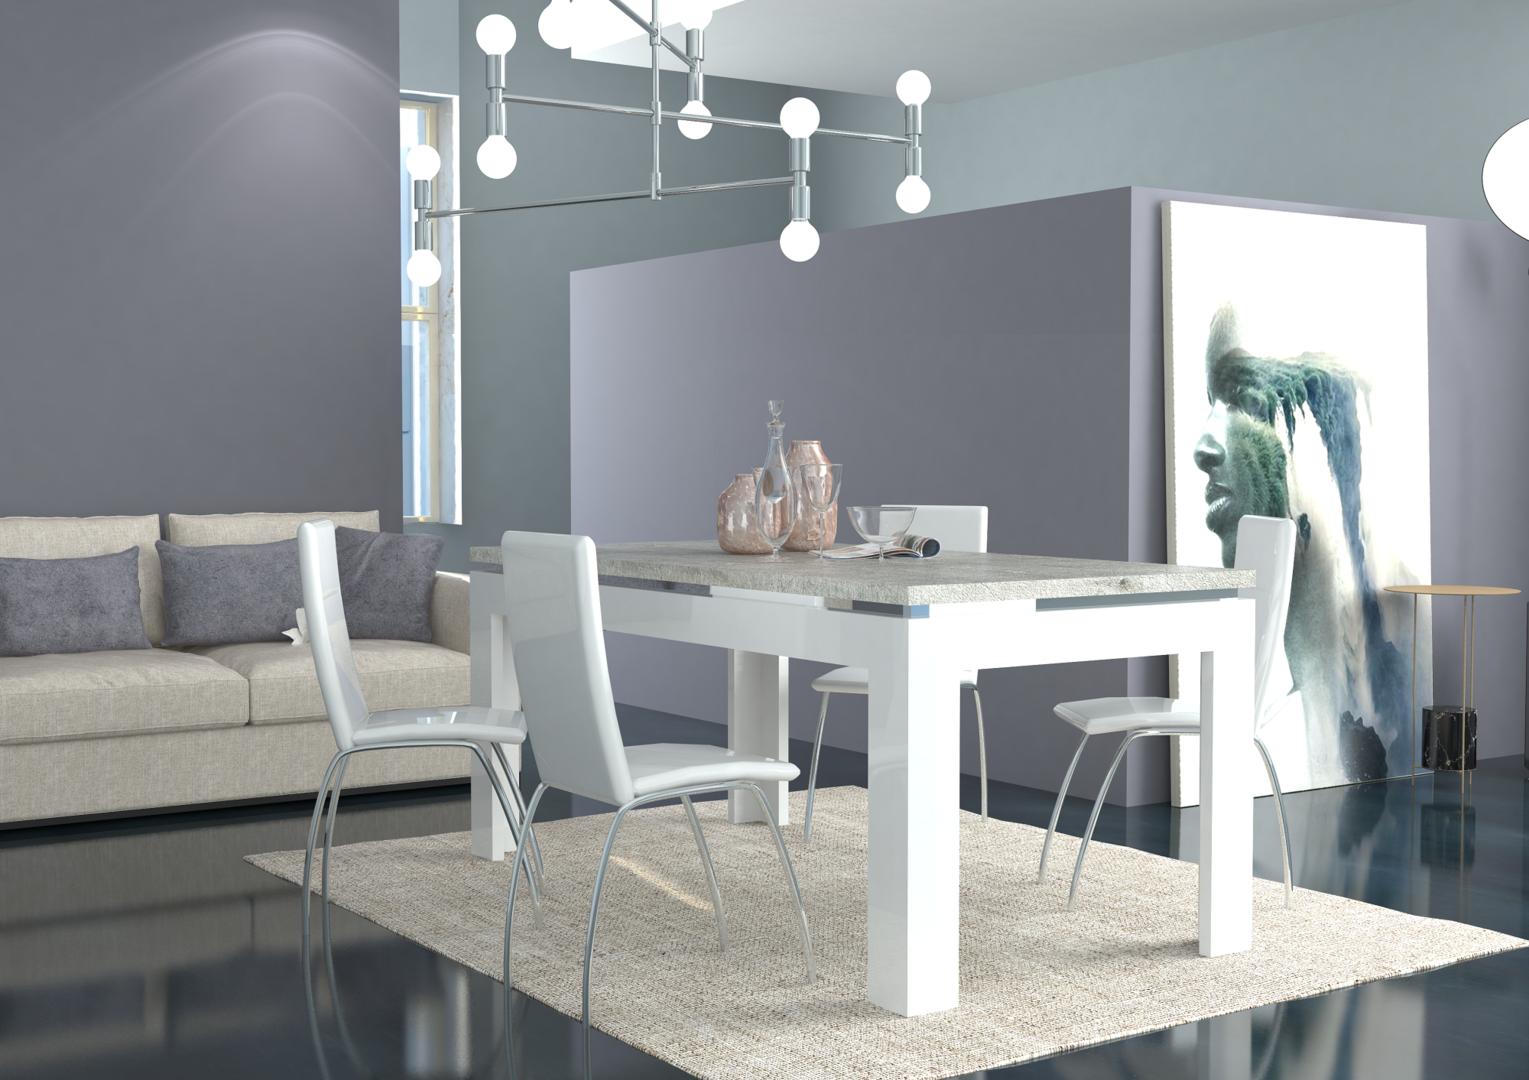 Tavolo moderno bianco messico mobile per sala da pranzo cucina - Stanza da pranzo moderna ...